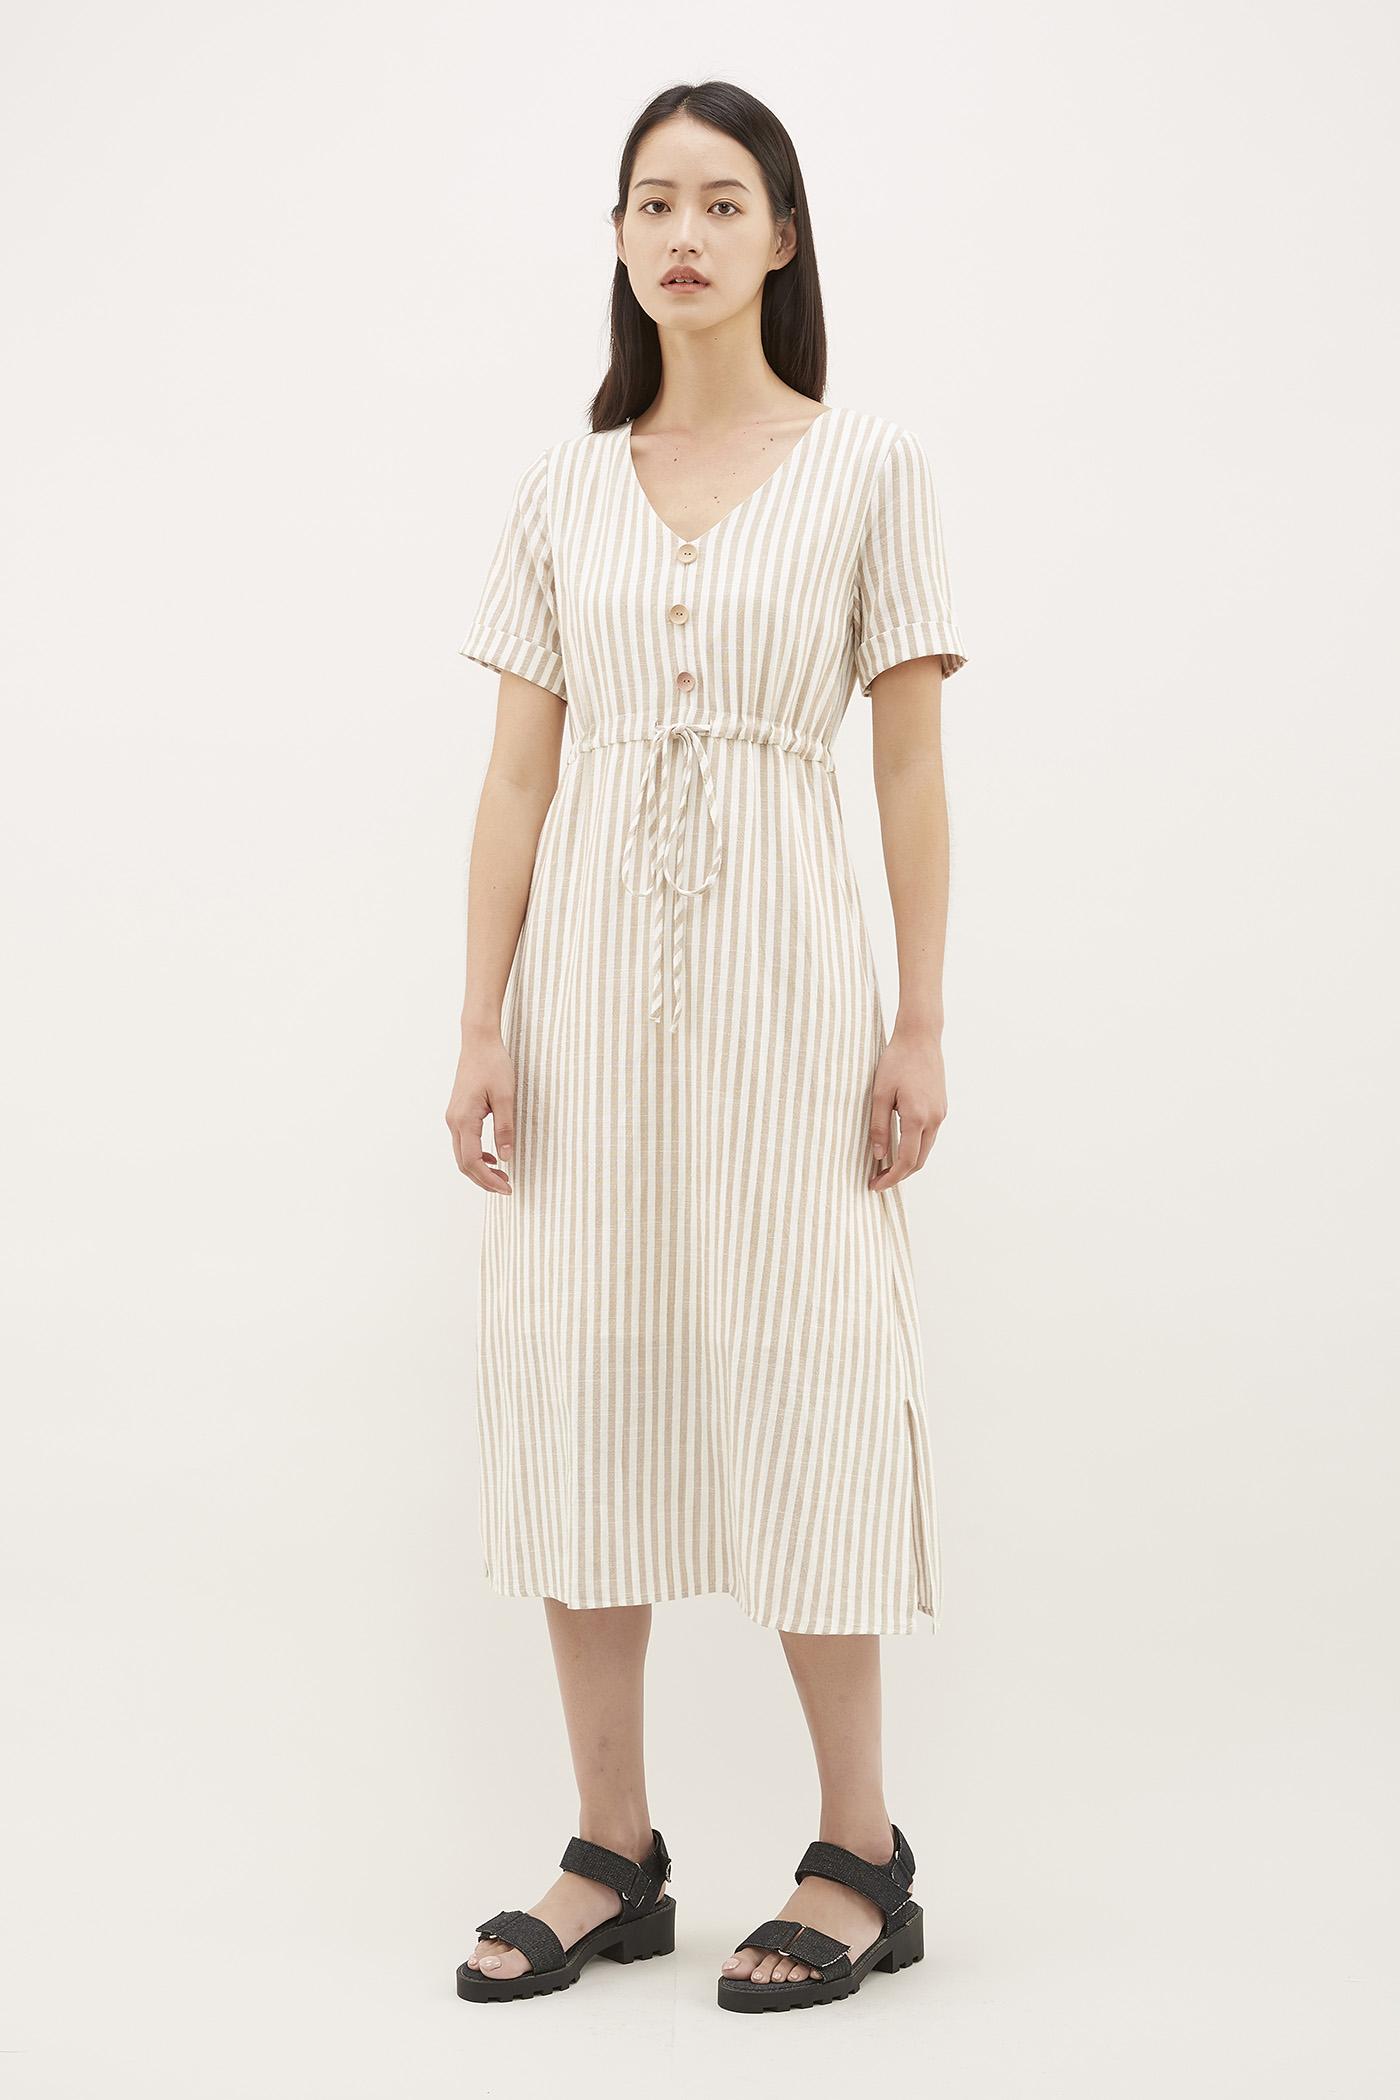 Airena Drawstring Dress